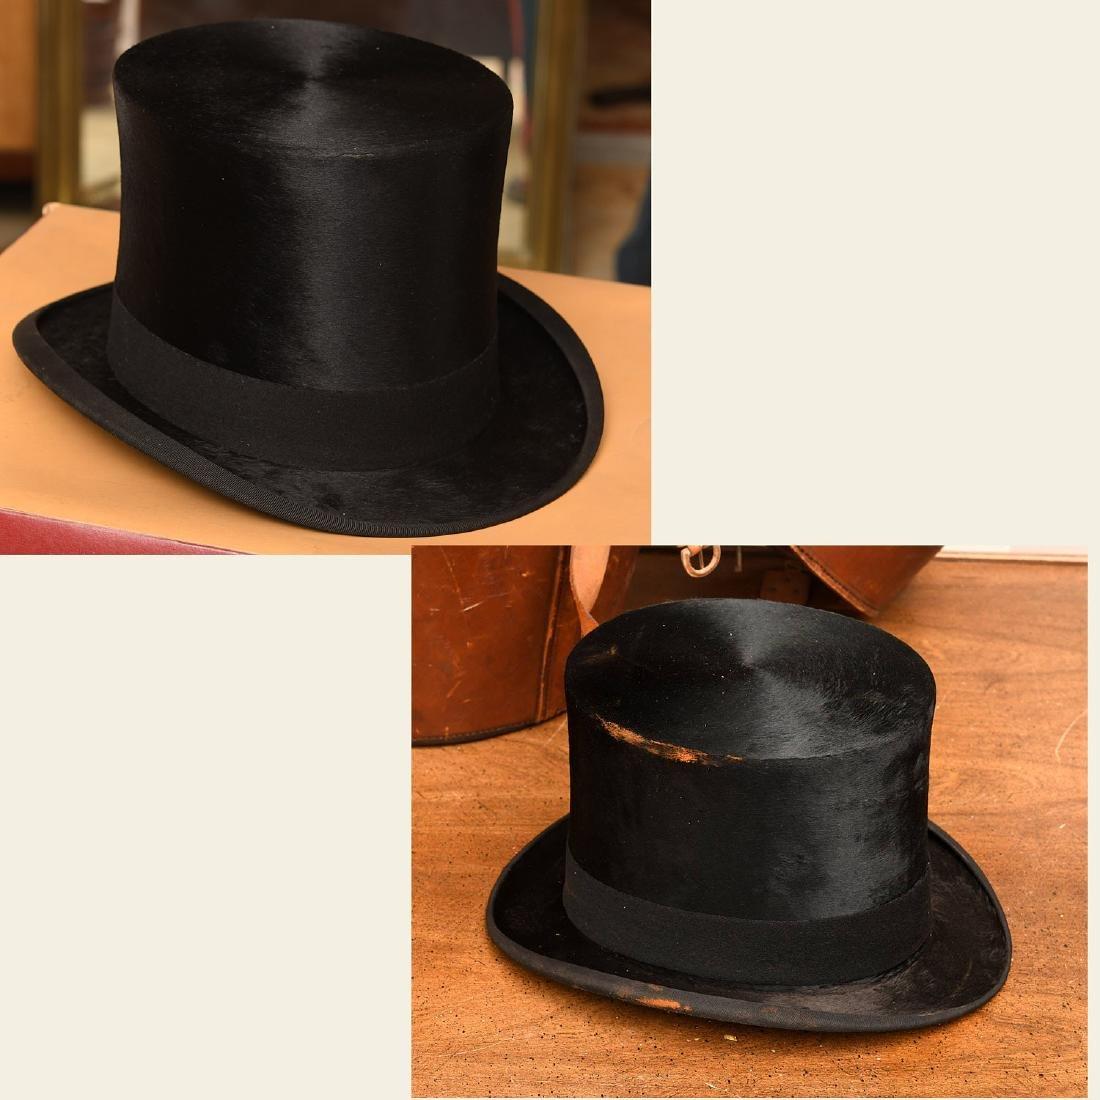 (2) vintage top hats